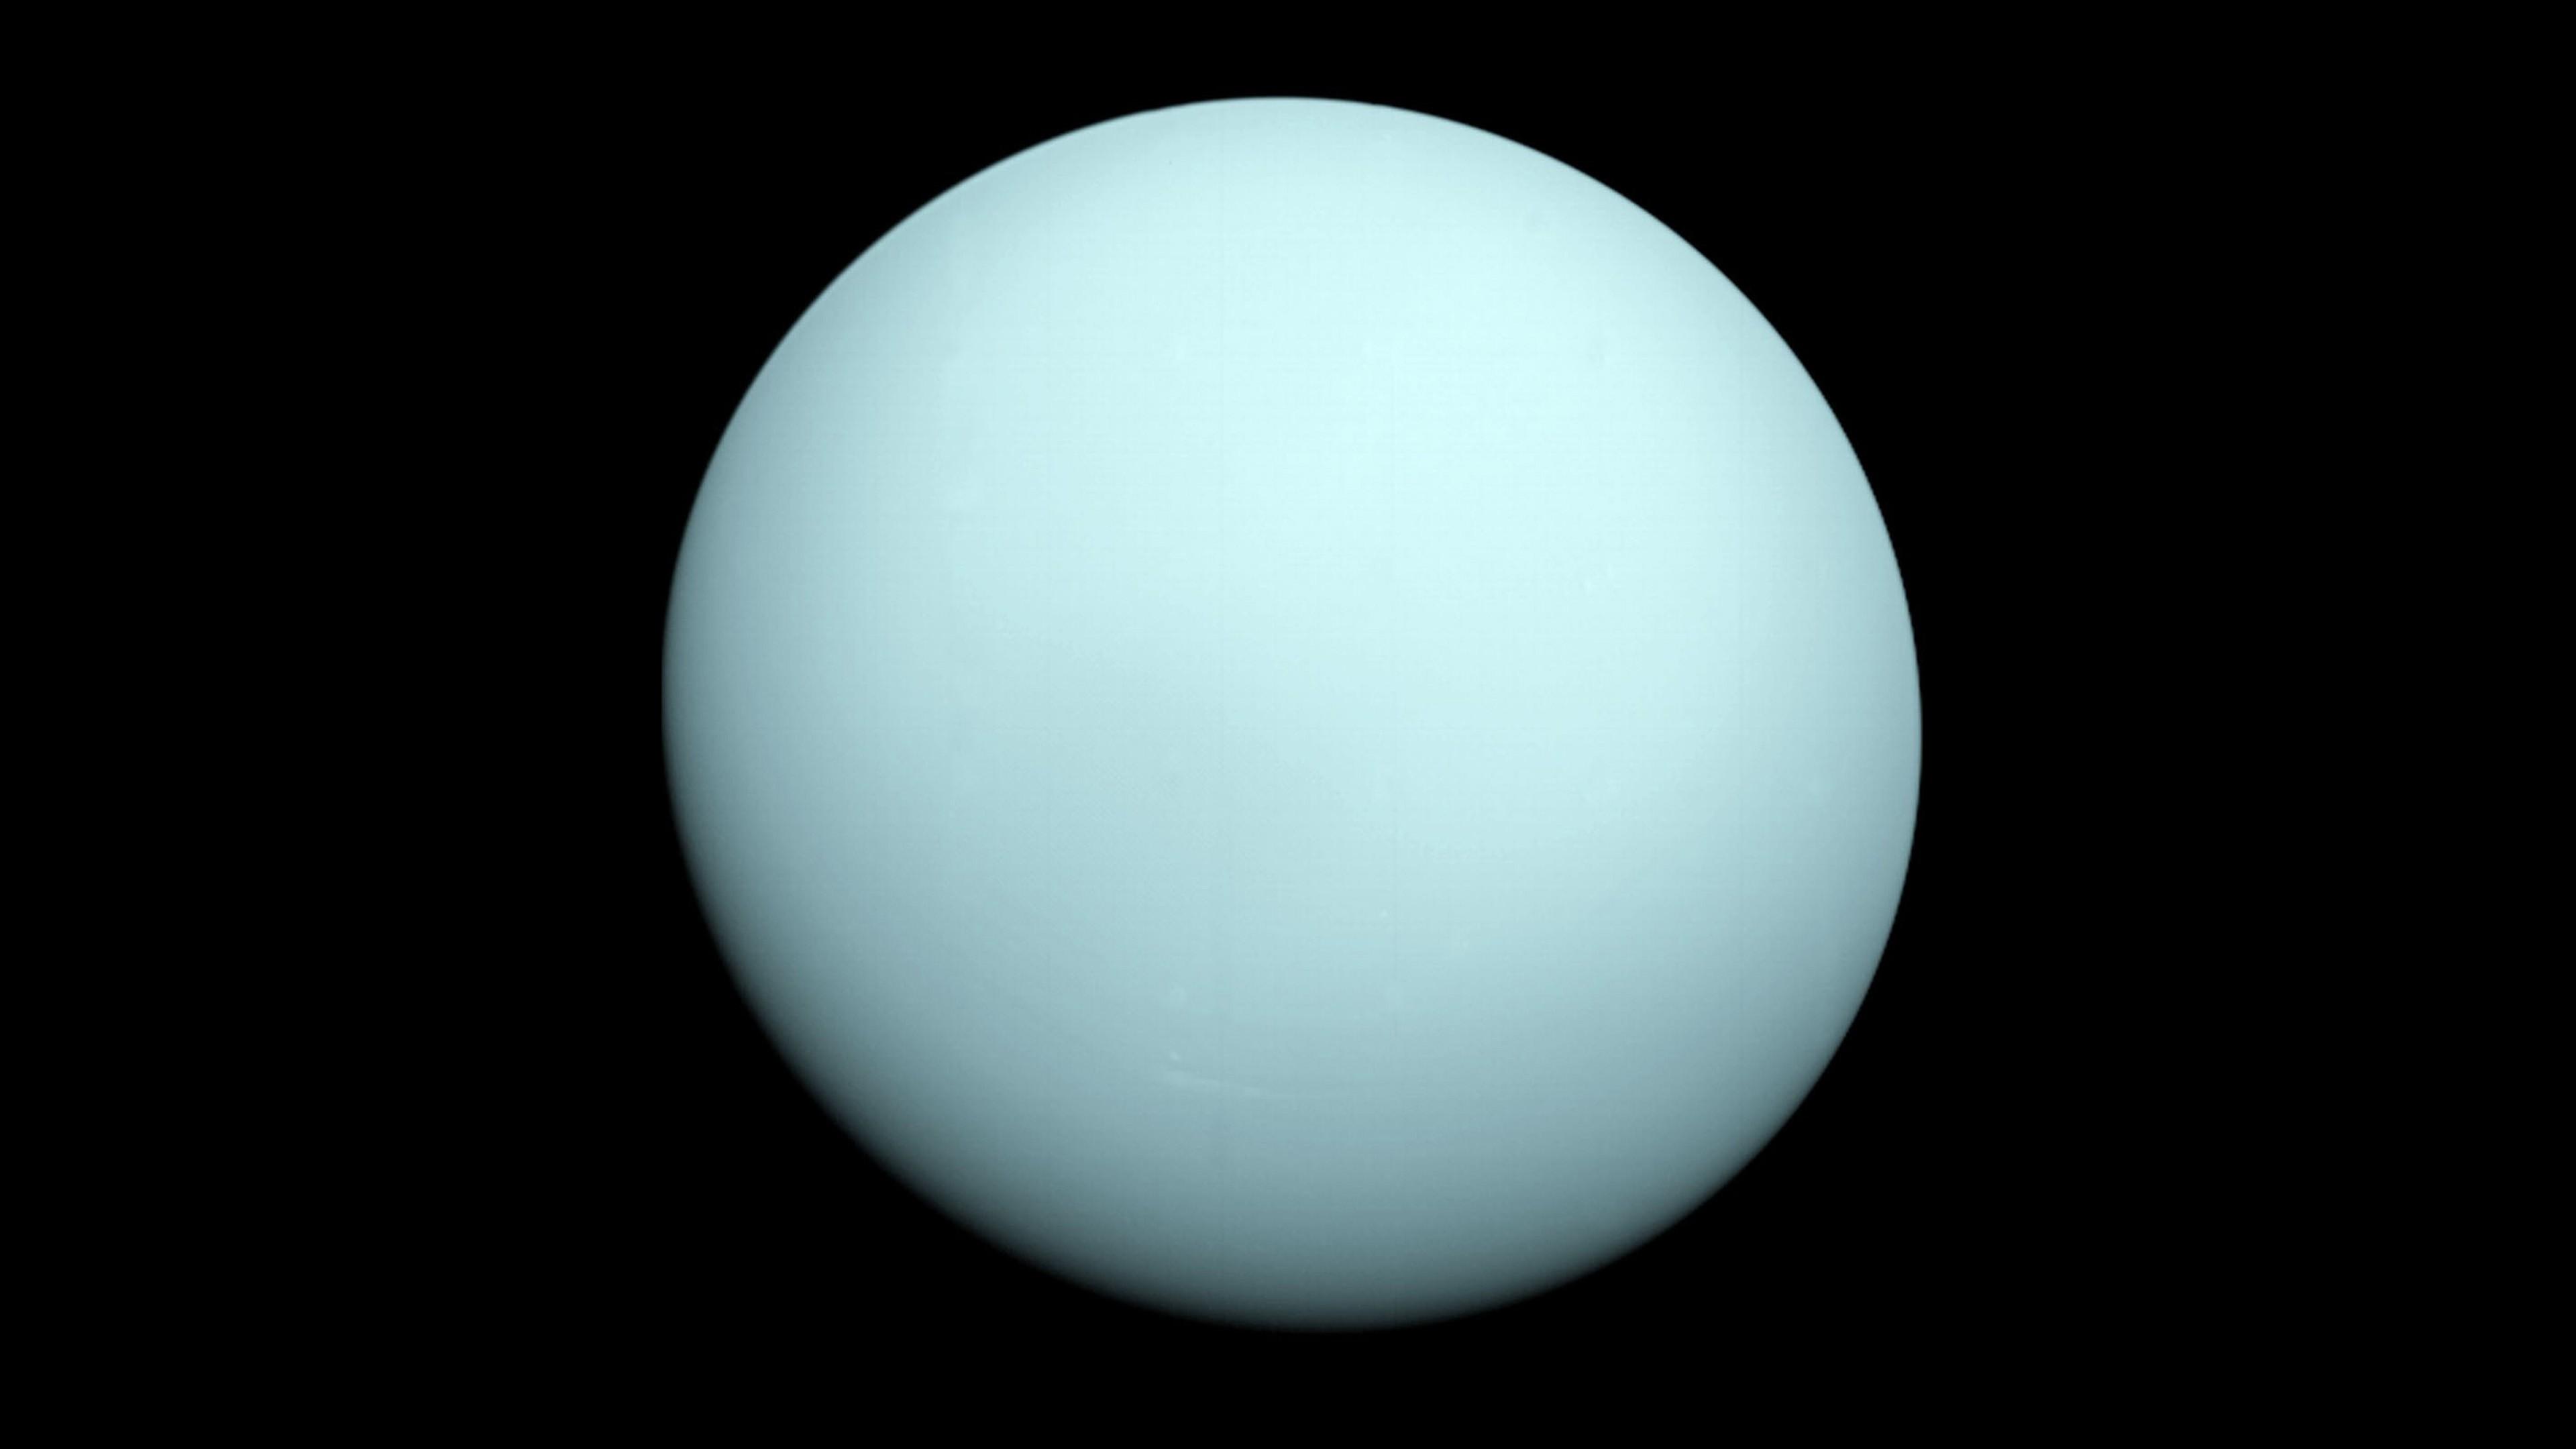 Planet Space Minimalism Sphere Sun Circle Atmosphere Ball Uranus Shape Astronomical Object